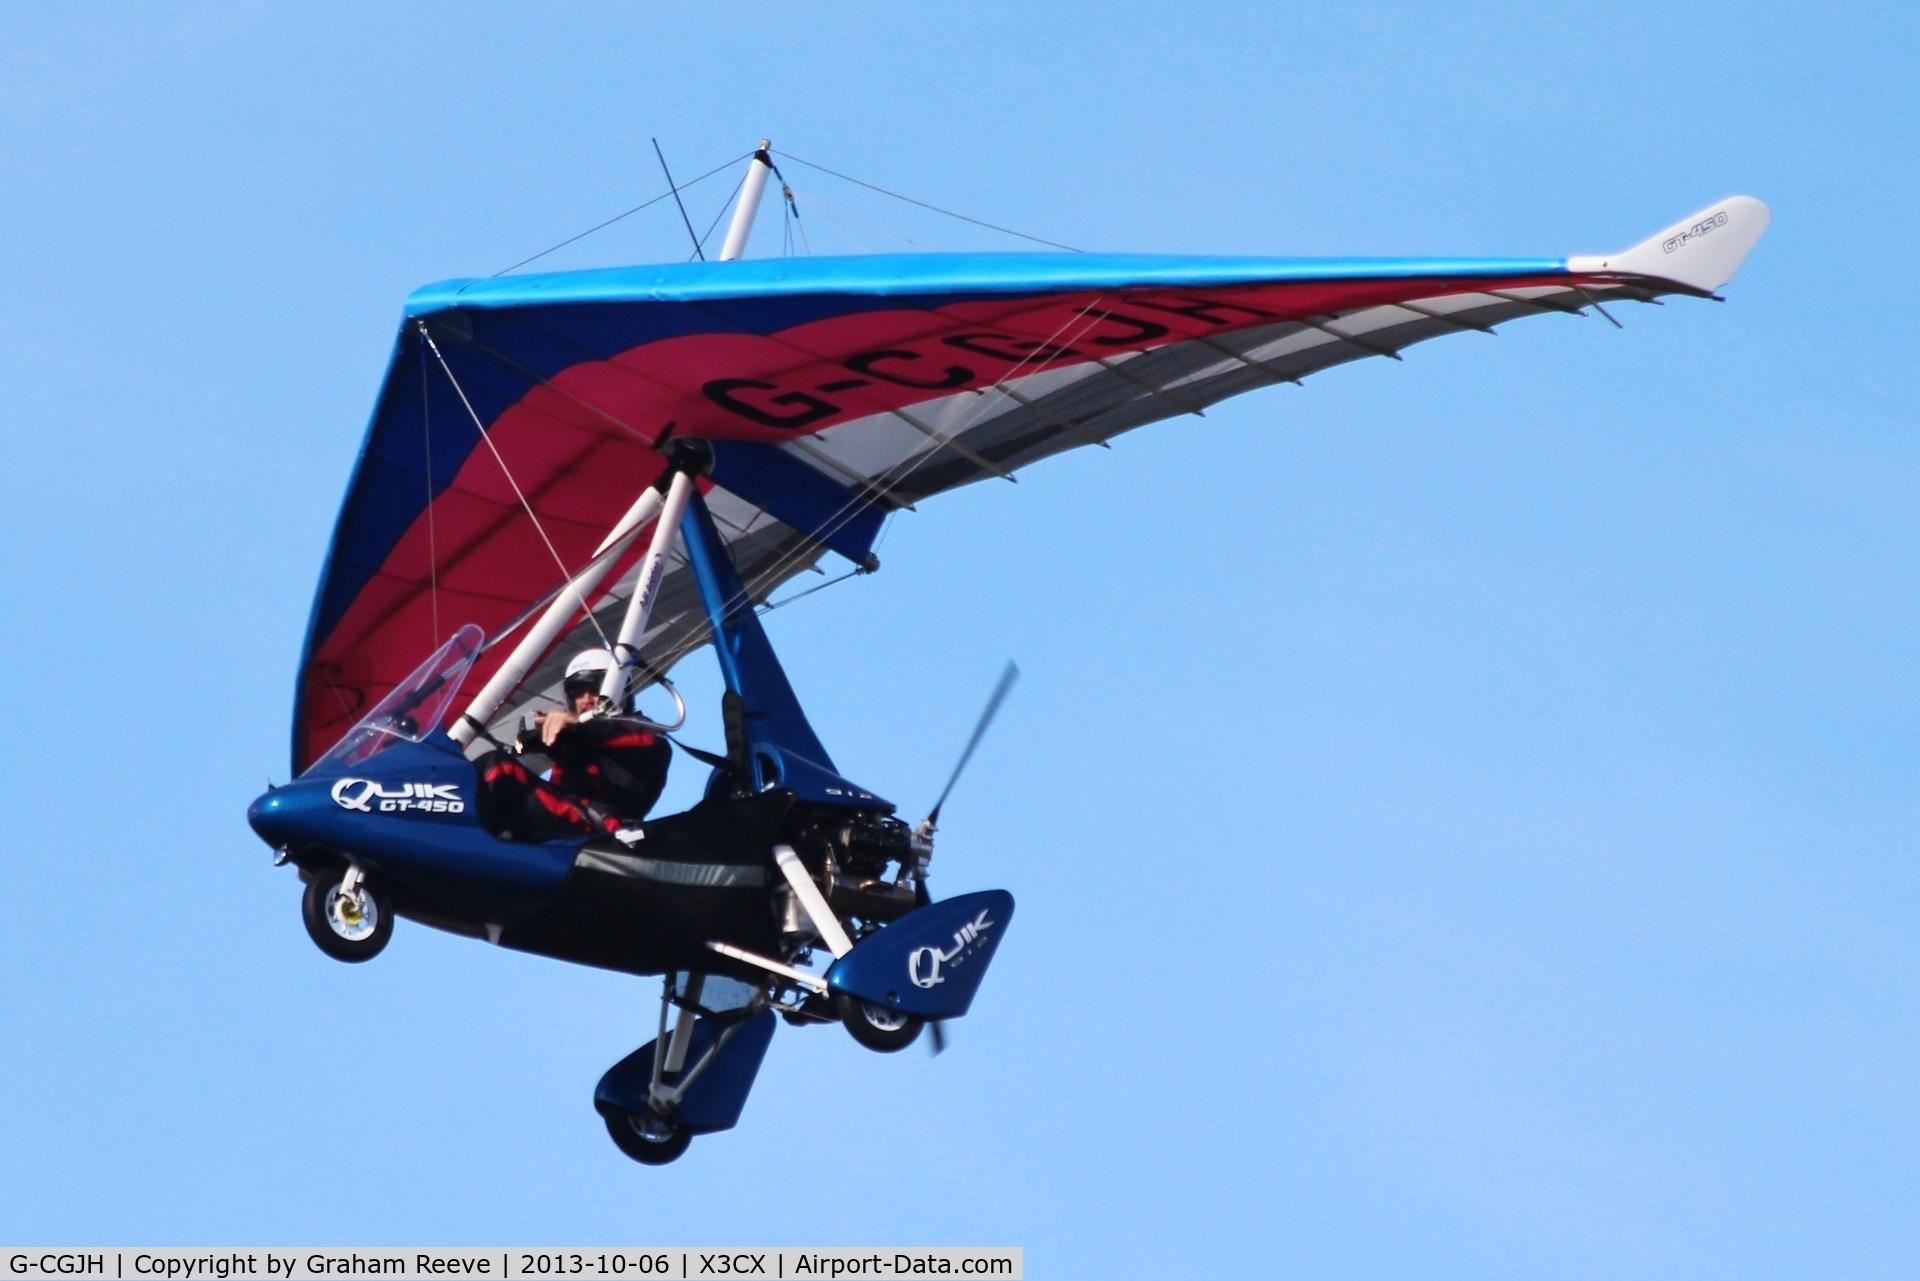 G-CGJH, P&M Aviation Quik GT450 C/N 8511, Over head at Northrepps.